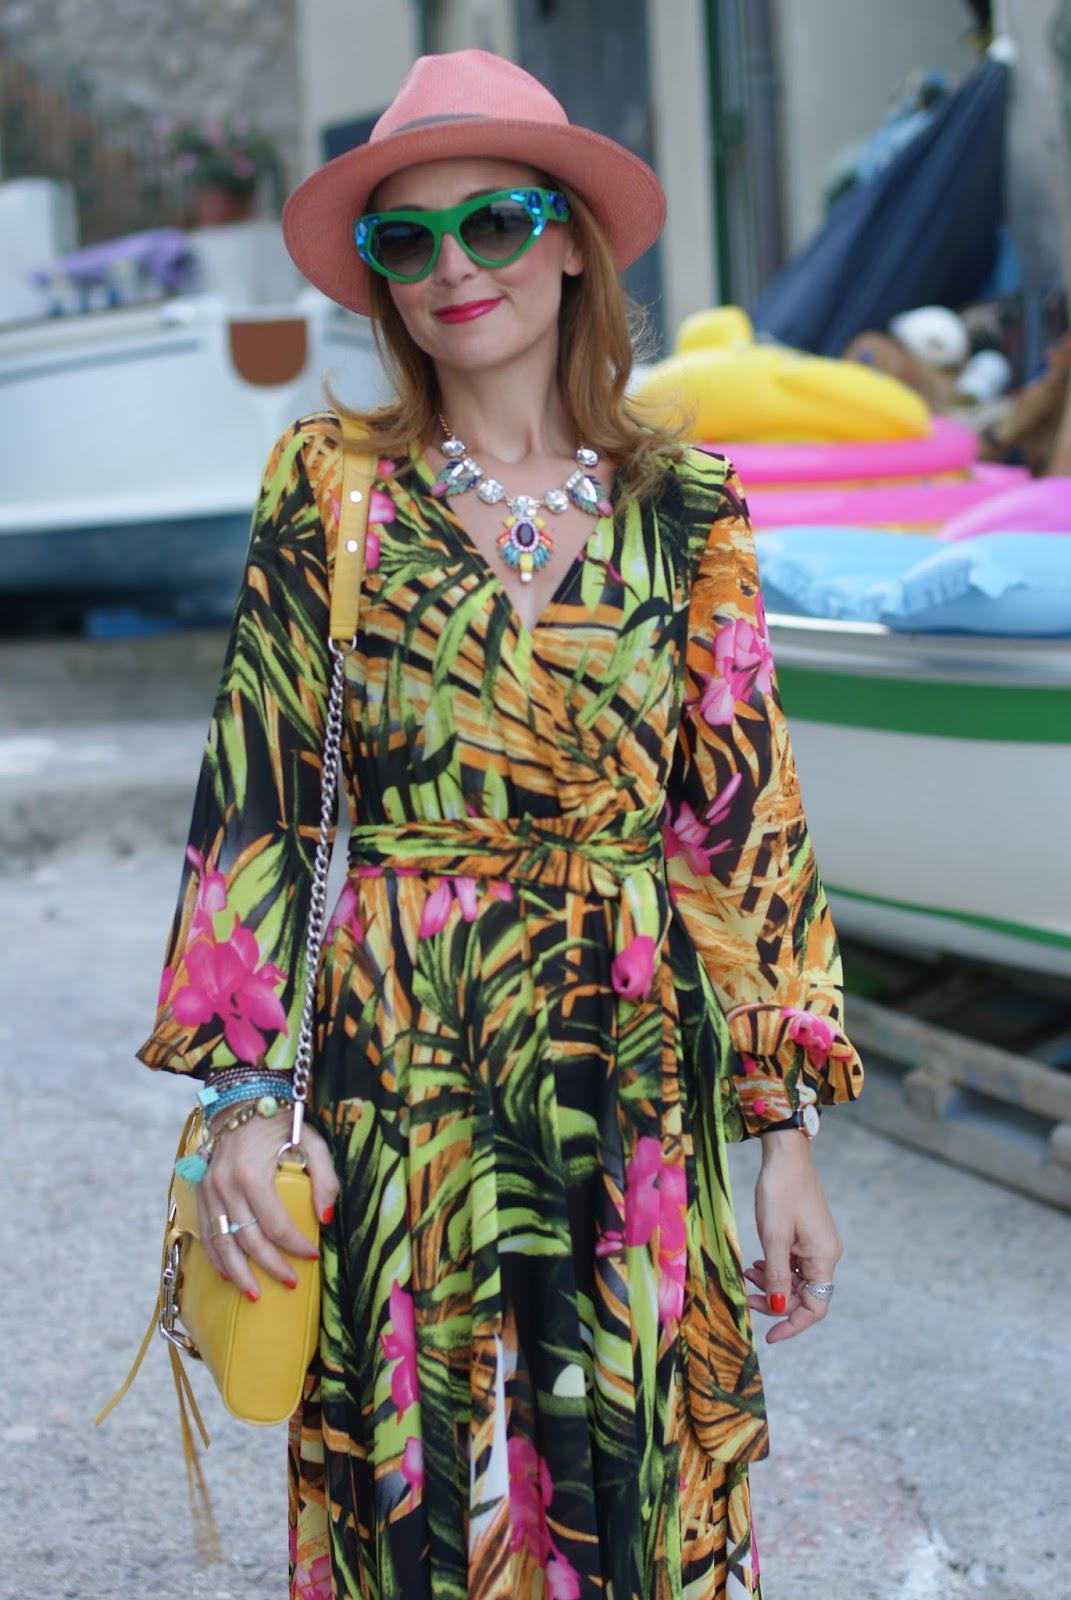 Ecua-Andino panama hat and tropical print chiffon maxi dress, summer boho style on Fashion and Cookies fashion blog, fashion blogger style